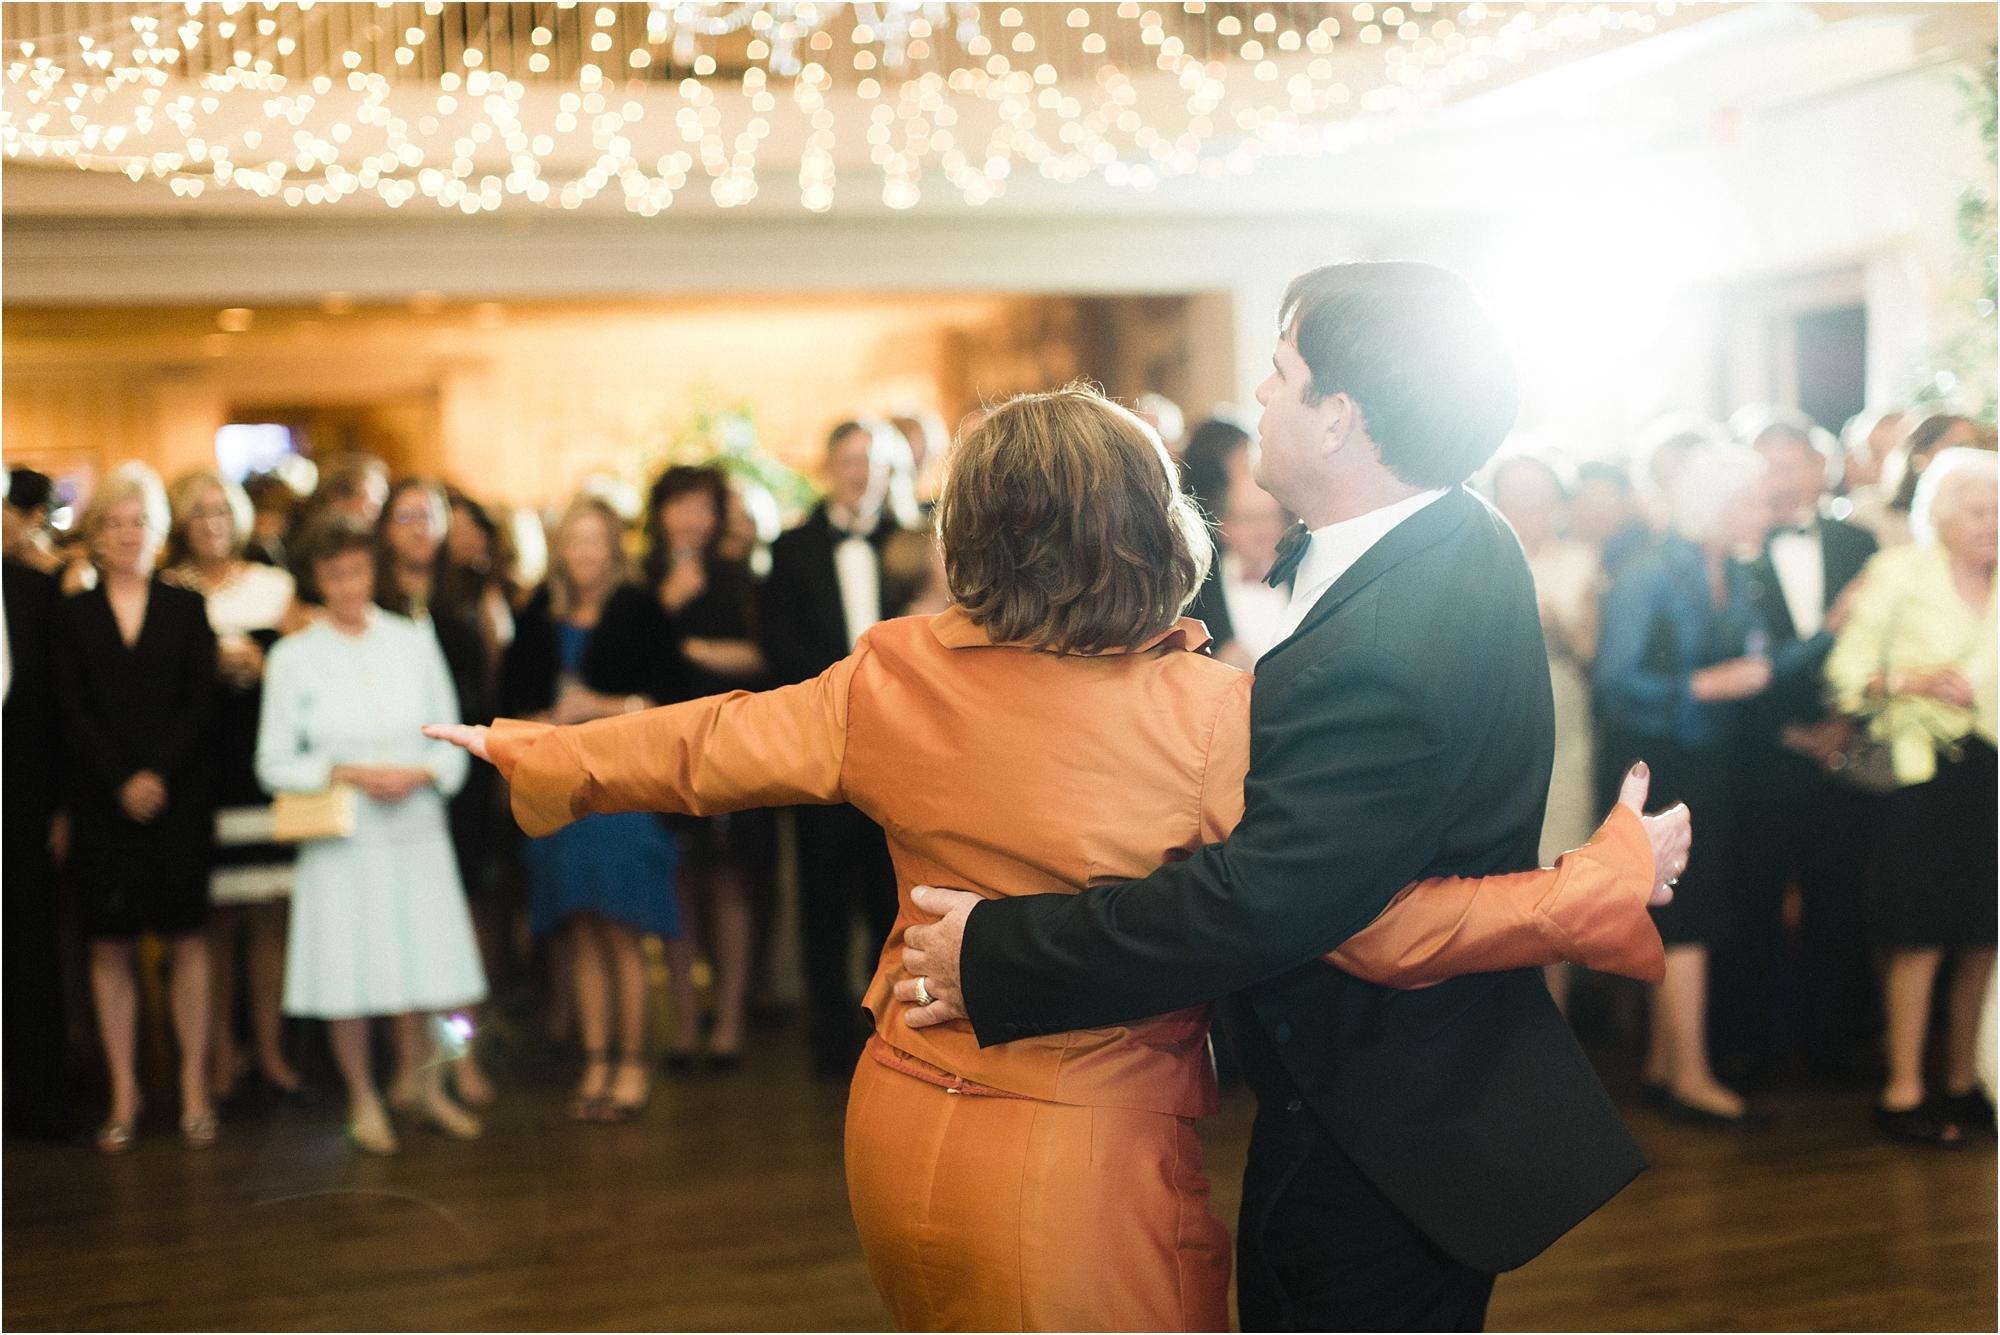 stephanie-yonce-photography-richmond-virginia-country-club-wedding-photo_042.JPG